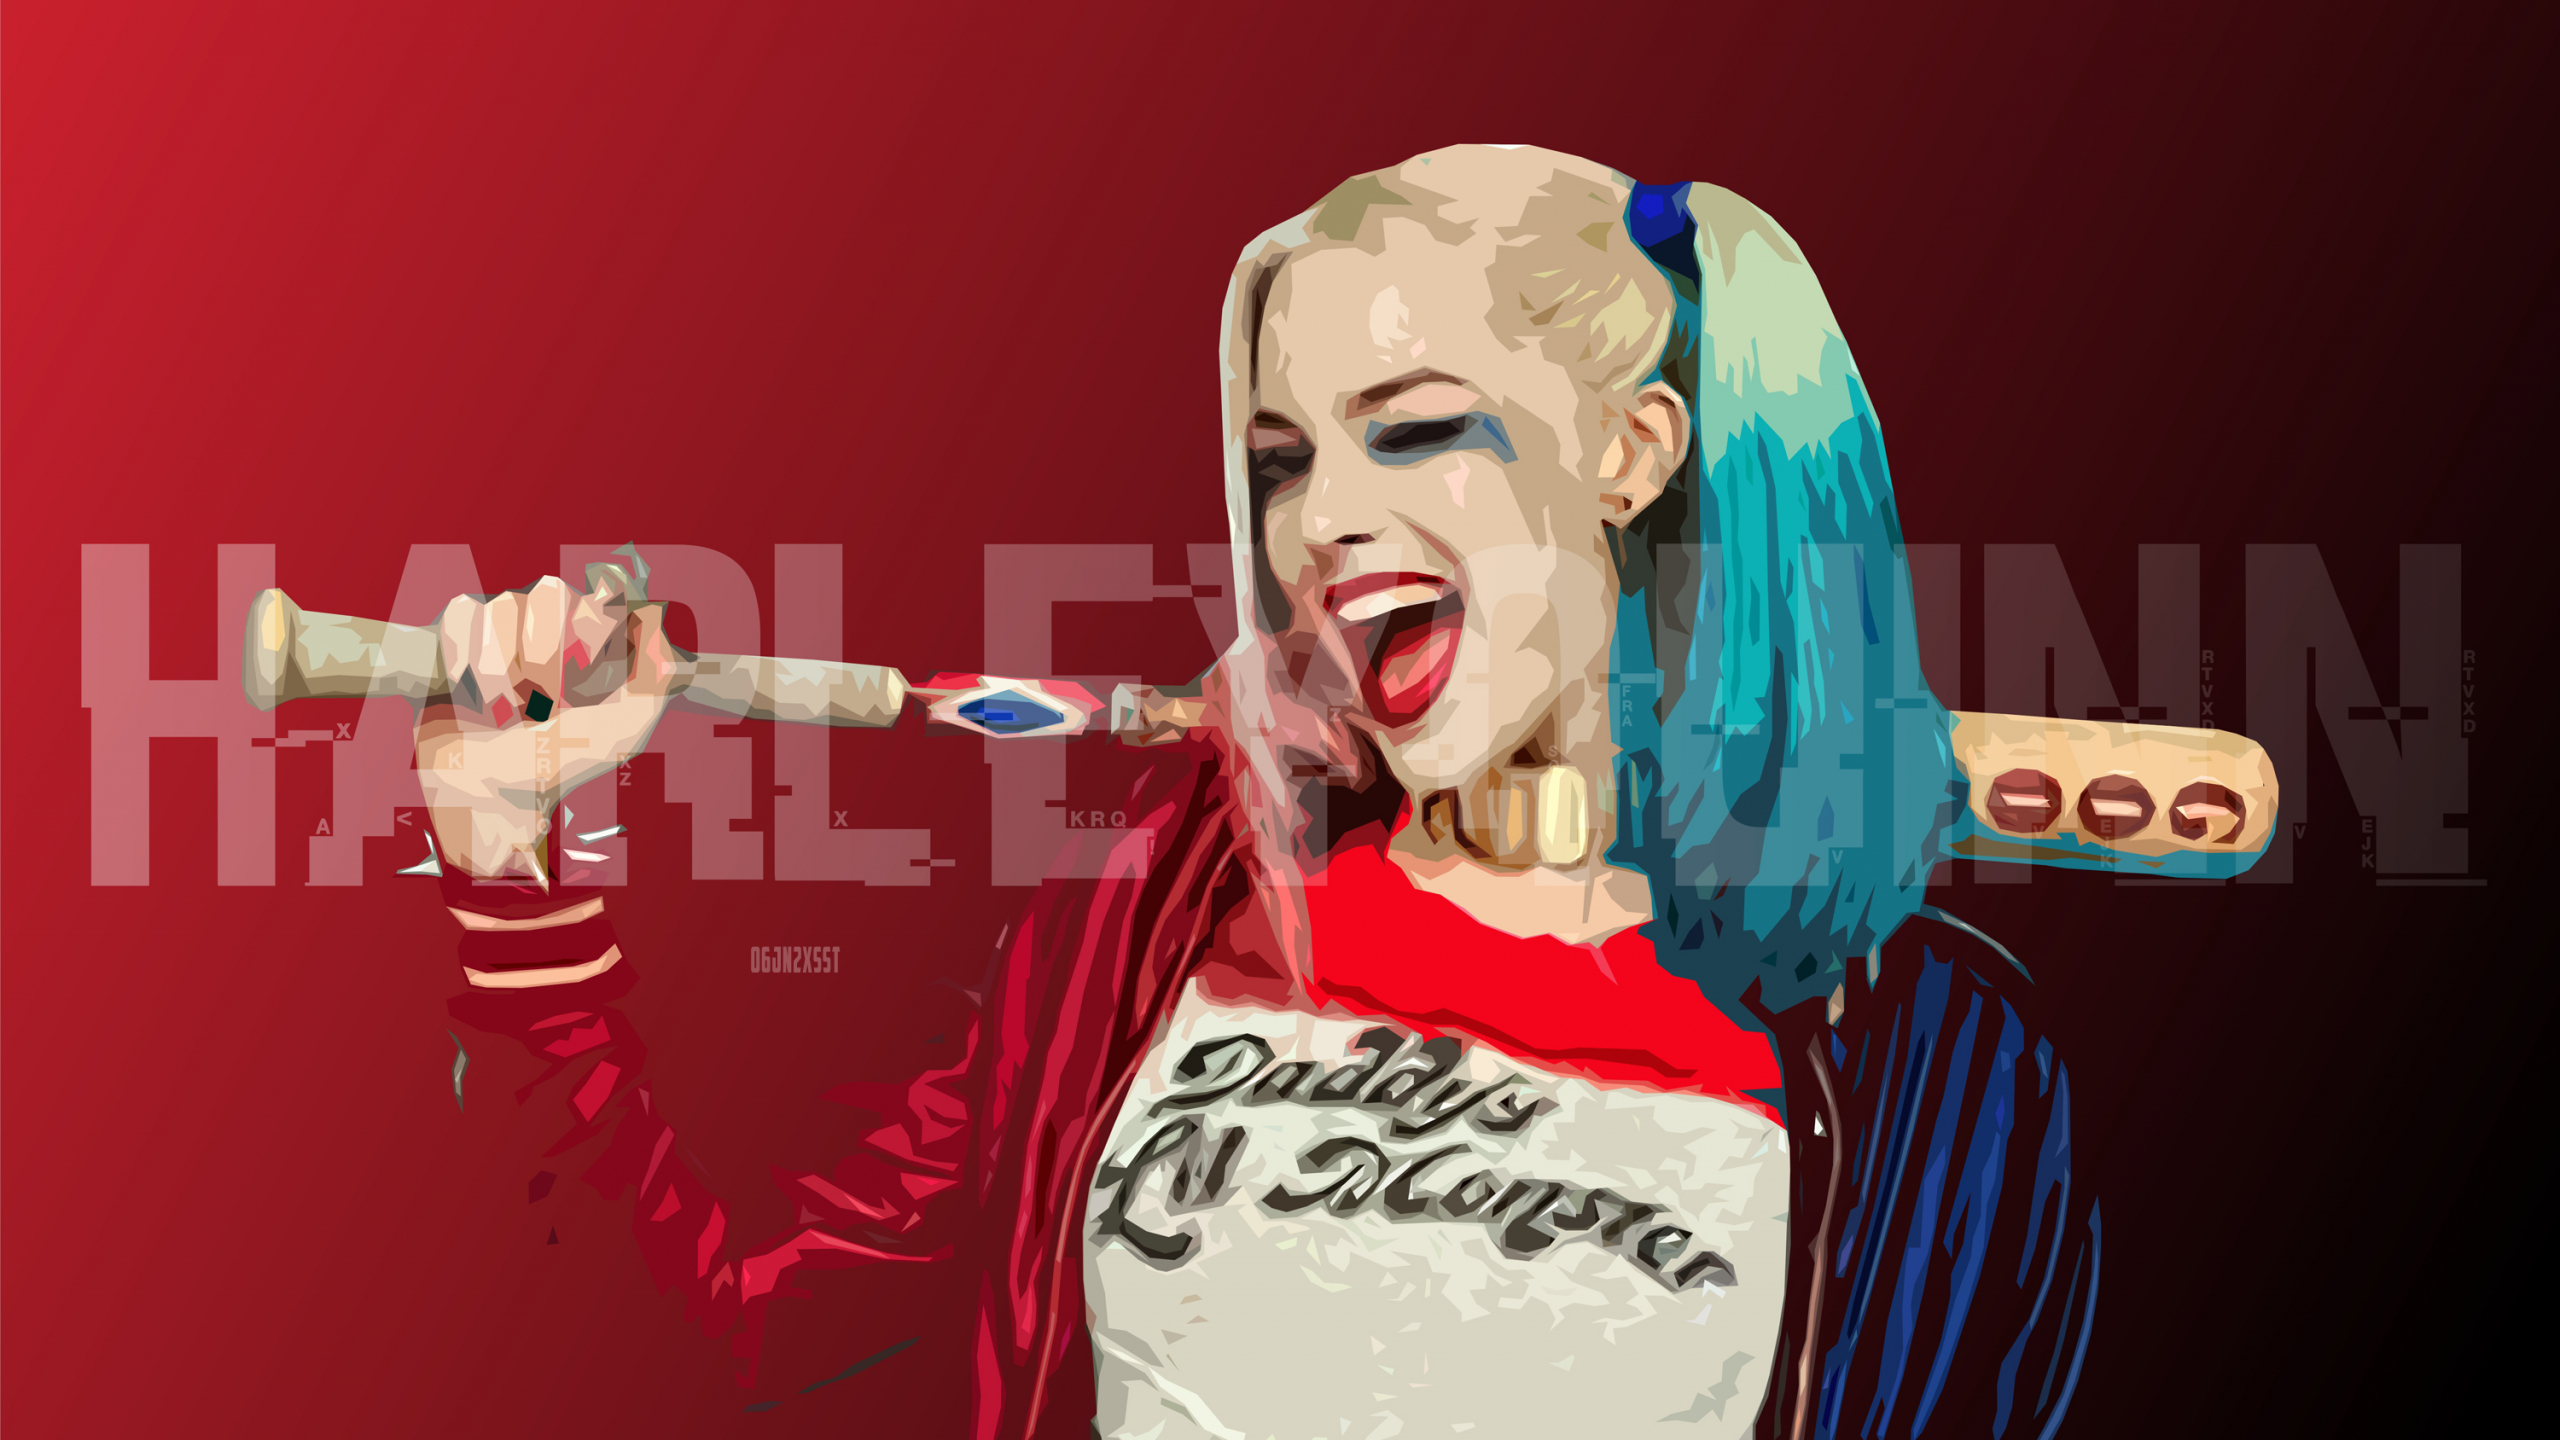 Desktop Wallpaper Harley Quinn Margot Robbie Art Hd Image Picture Background Xpnw